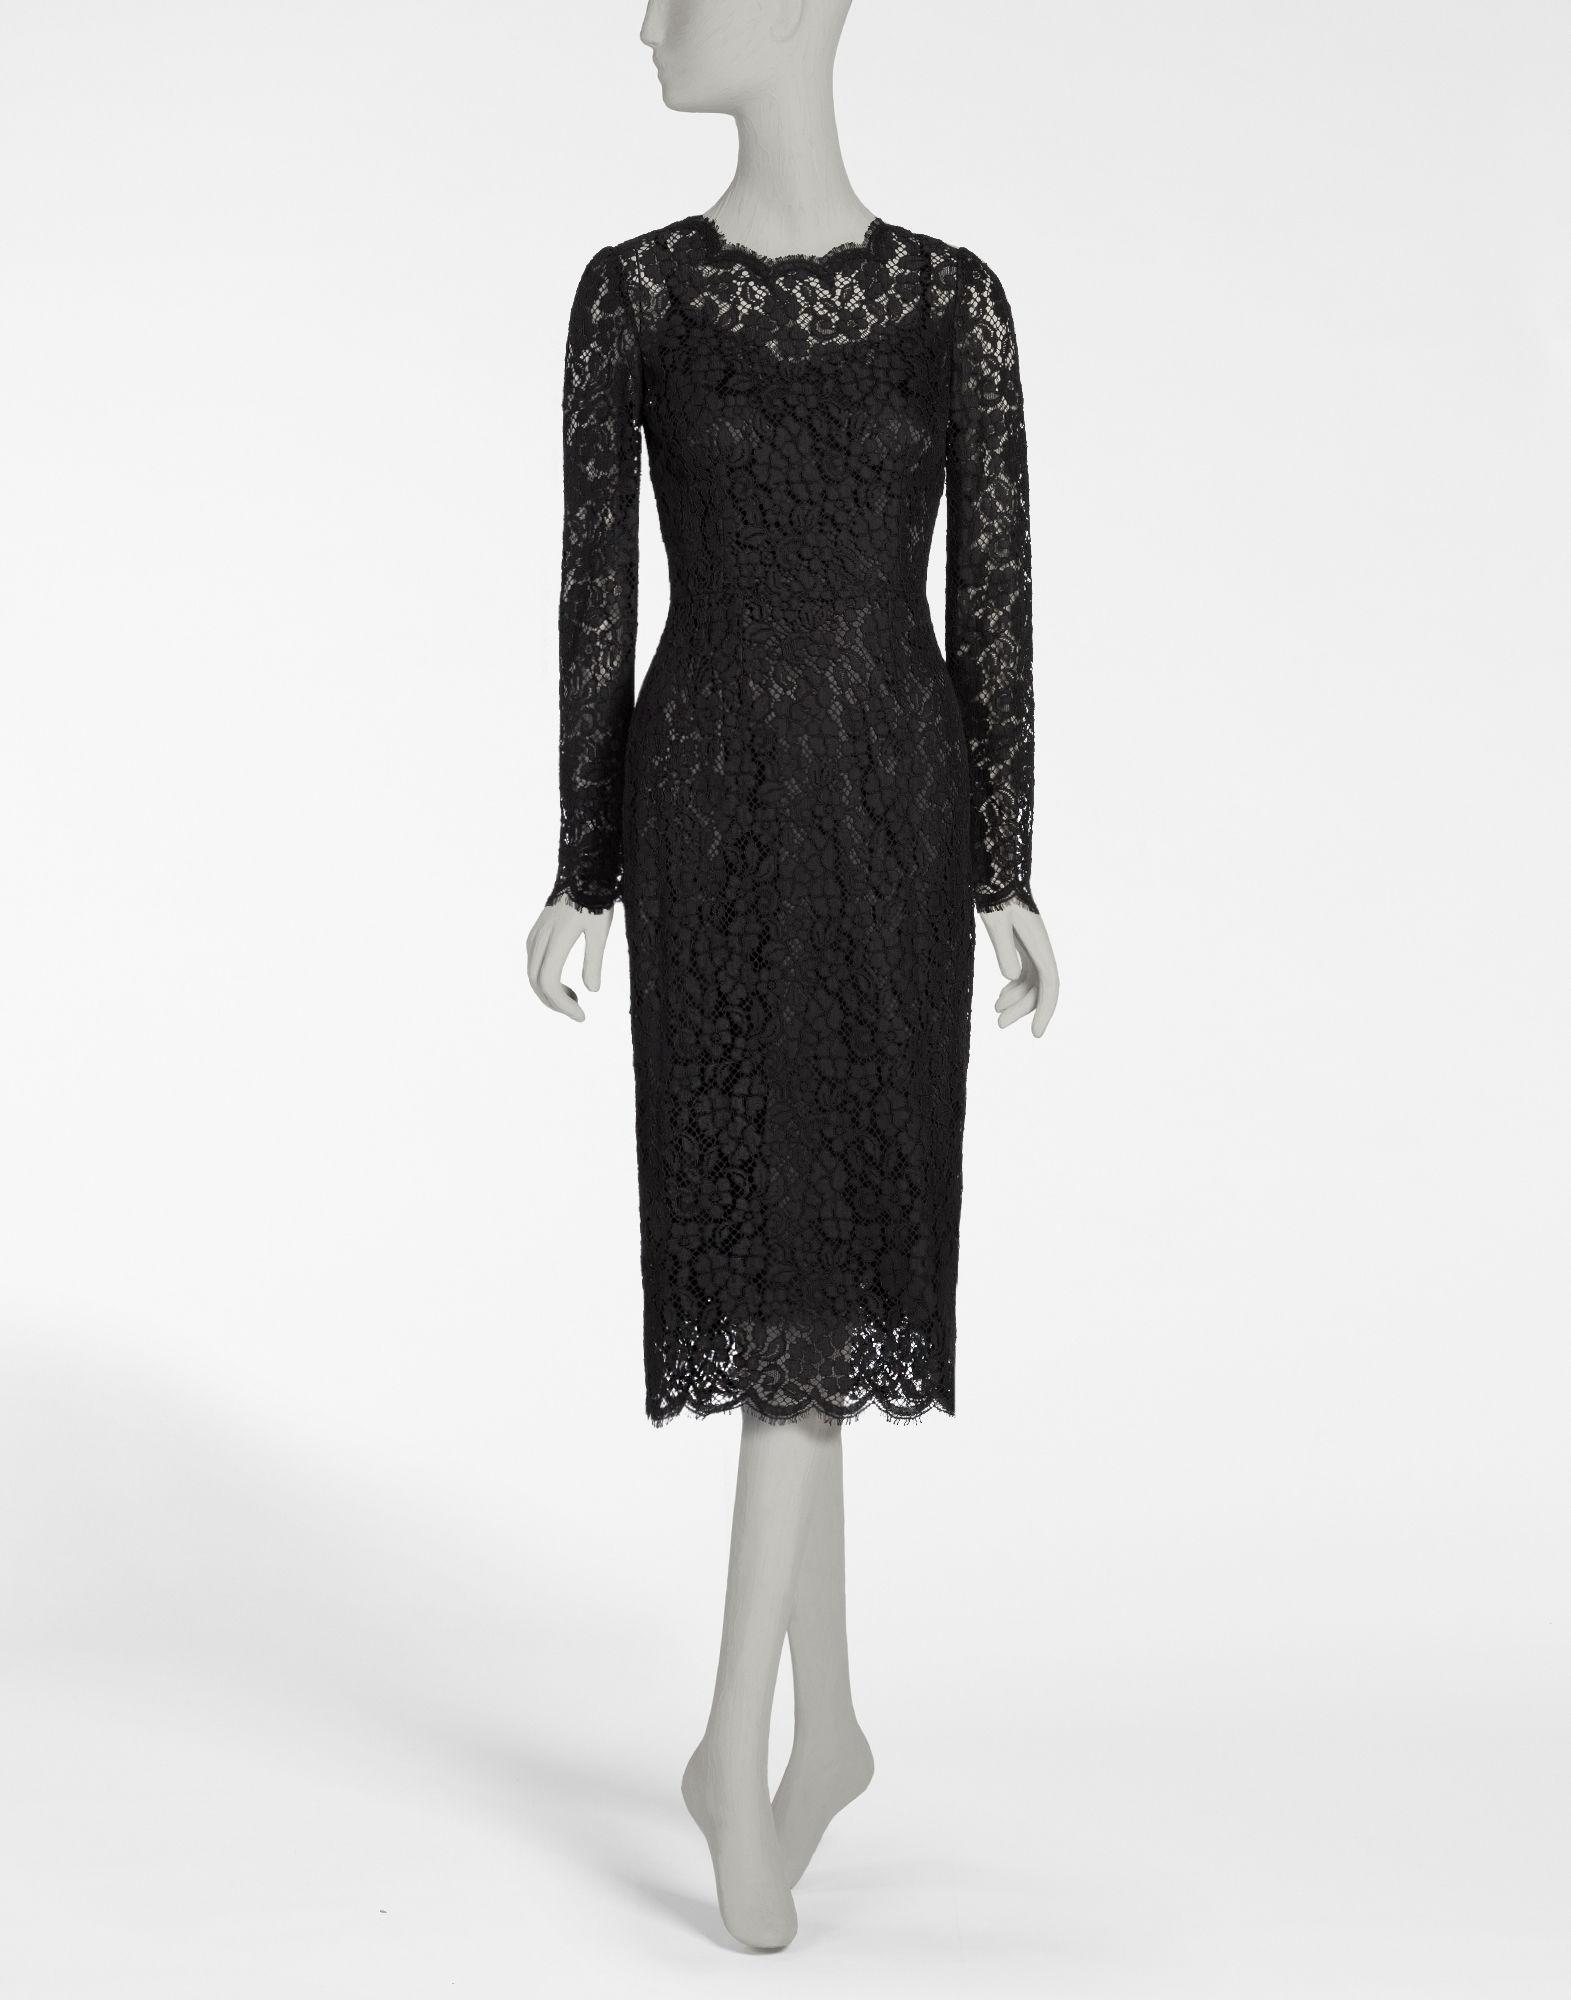 DOLCE & GABBANA Floral-Lace Long-Sleeve Dress, Black at DOLCE & GABBANA